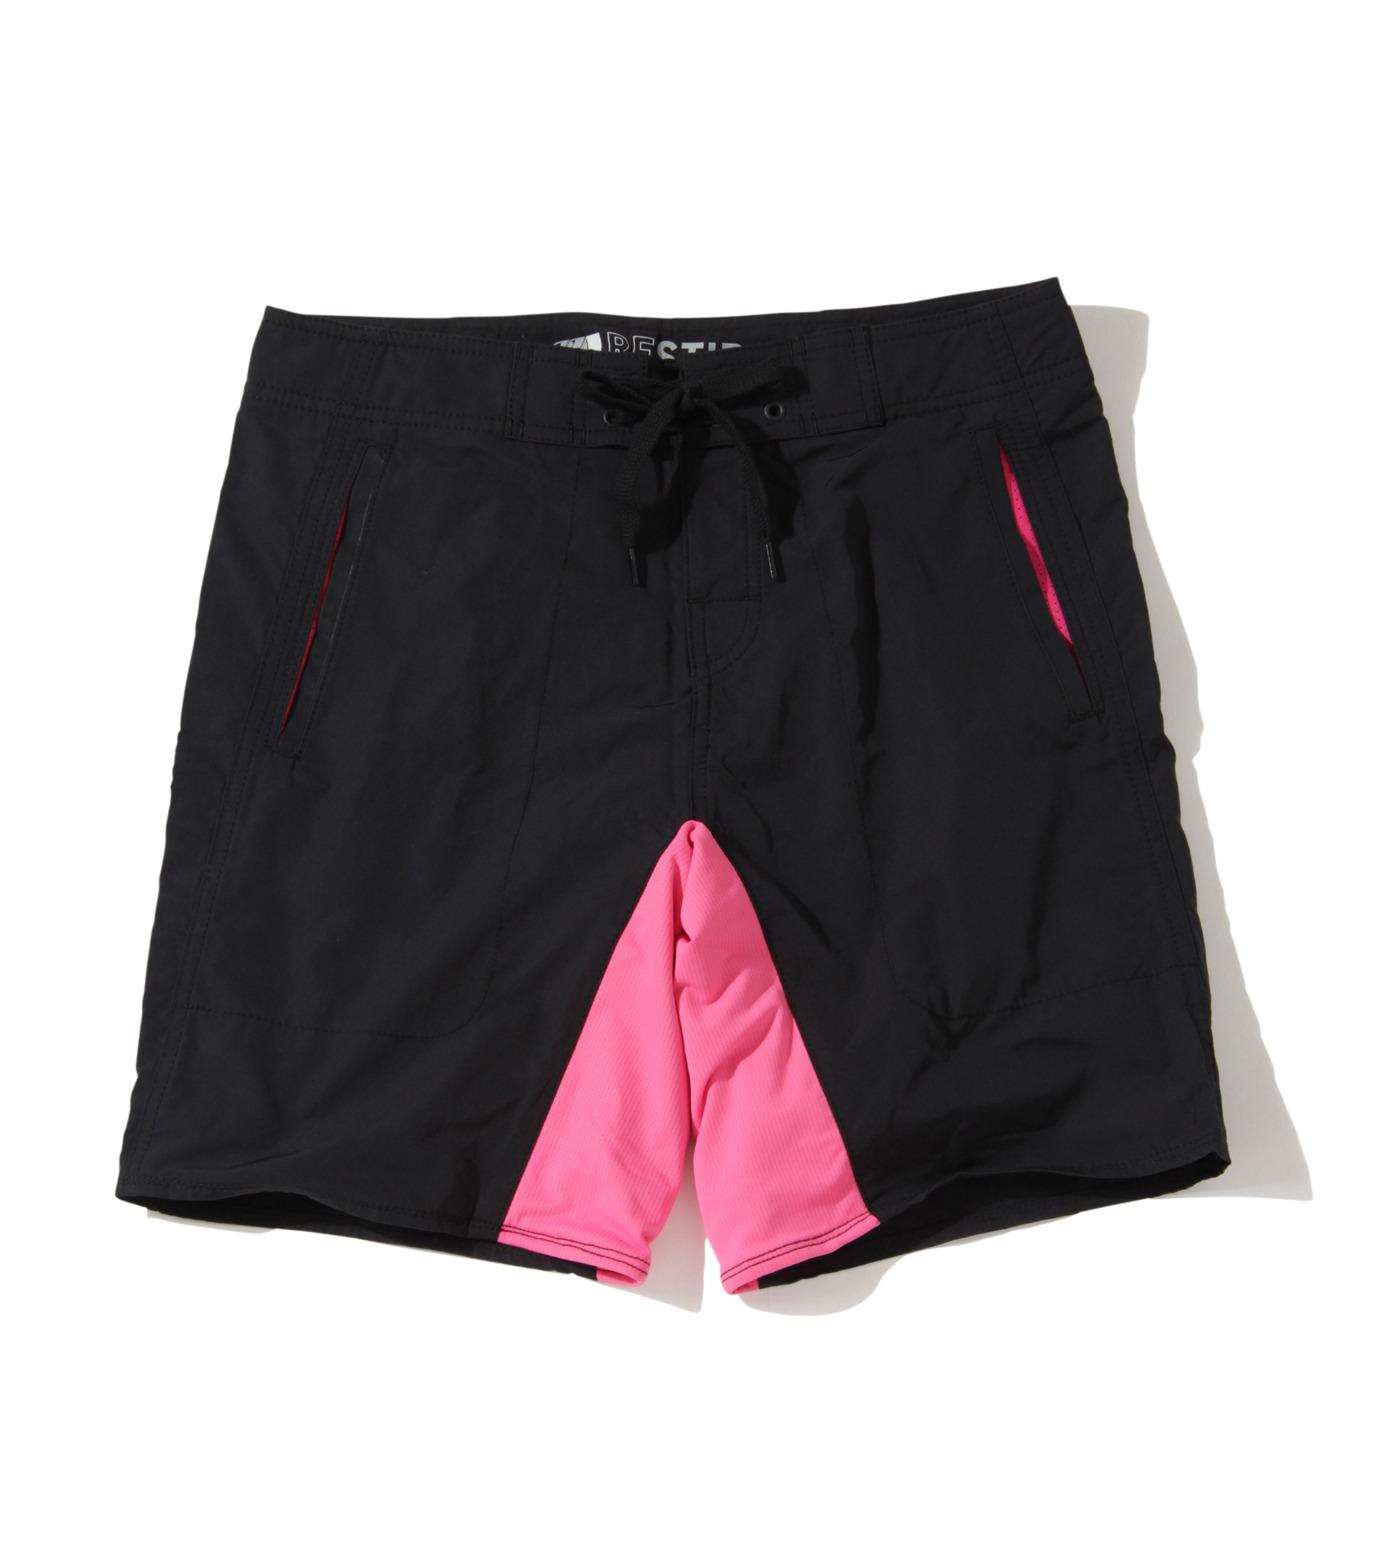 TWO TWO ONE(トゥートゥーワン)のSurf shorts short-PINK(SWIMWEAR/SWIMWEAR)-15N948001-72 拡大詳細画像1